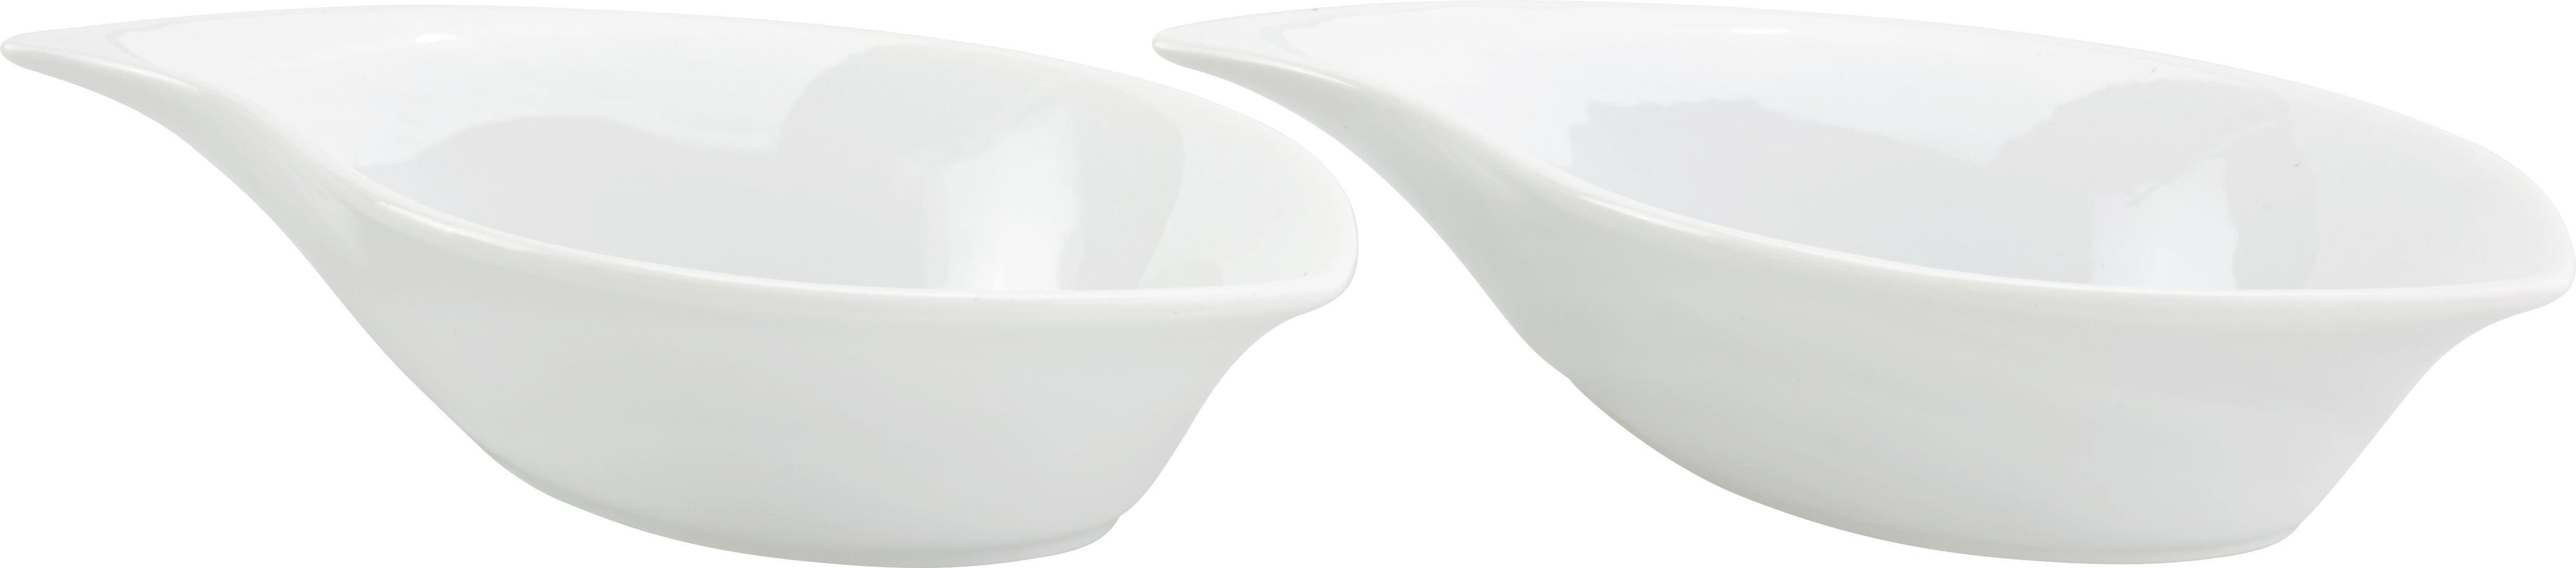 Schalenset Onde 2-er Set - Weiß, MODERN (17,2/9,9/3,7cm) - MÖMAX modern living